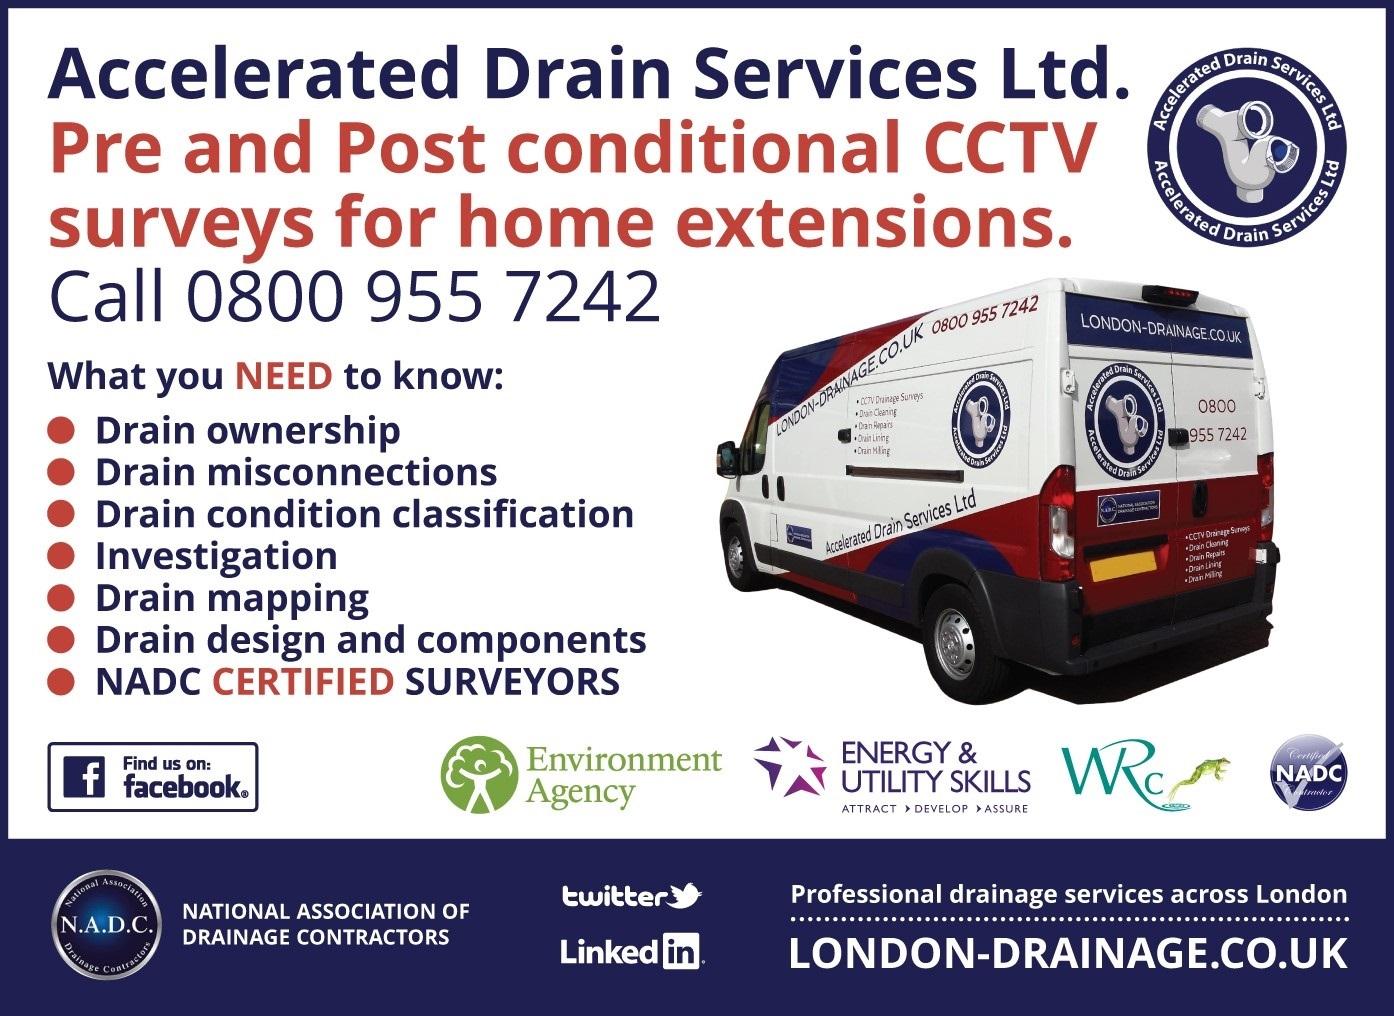 Build Over Drainage Surveys, Hammersmith and Fulham - NW10, SW6, W10, W12, W3, W4